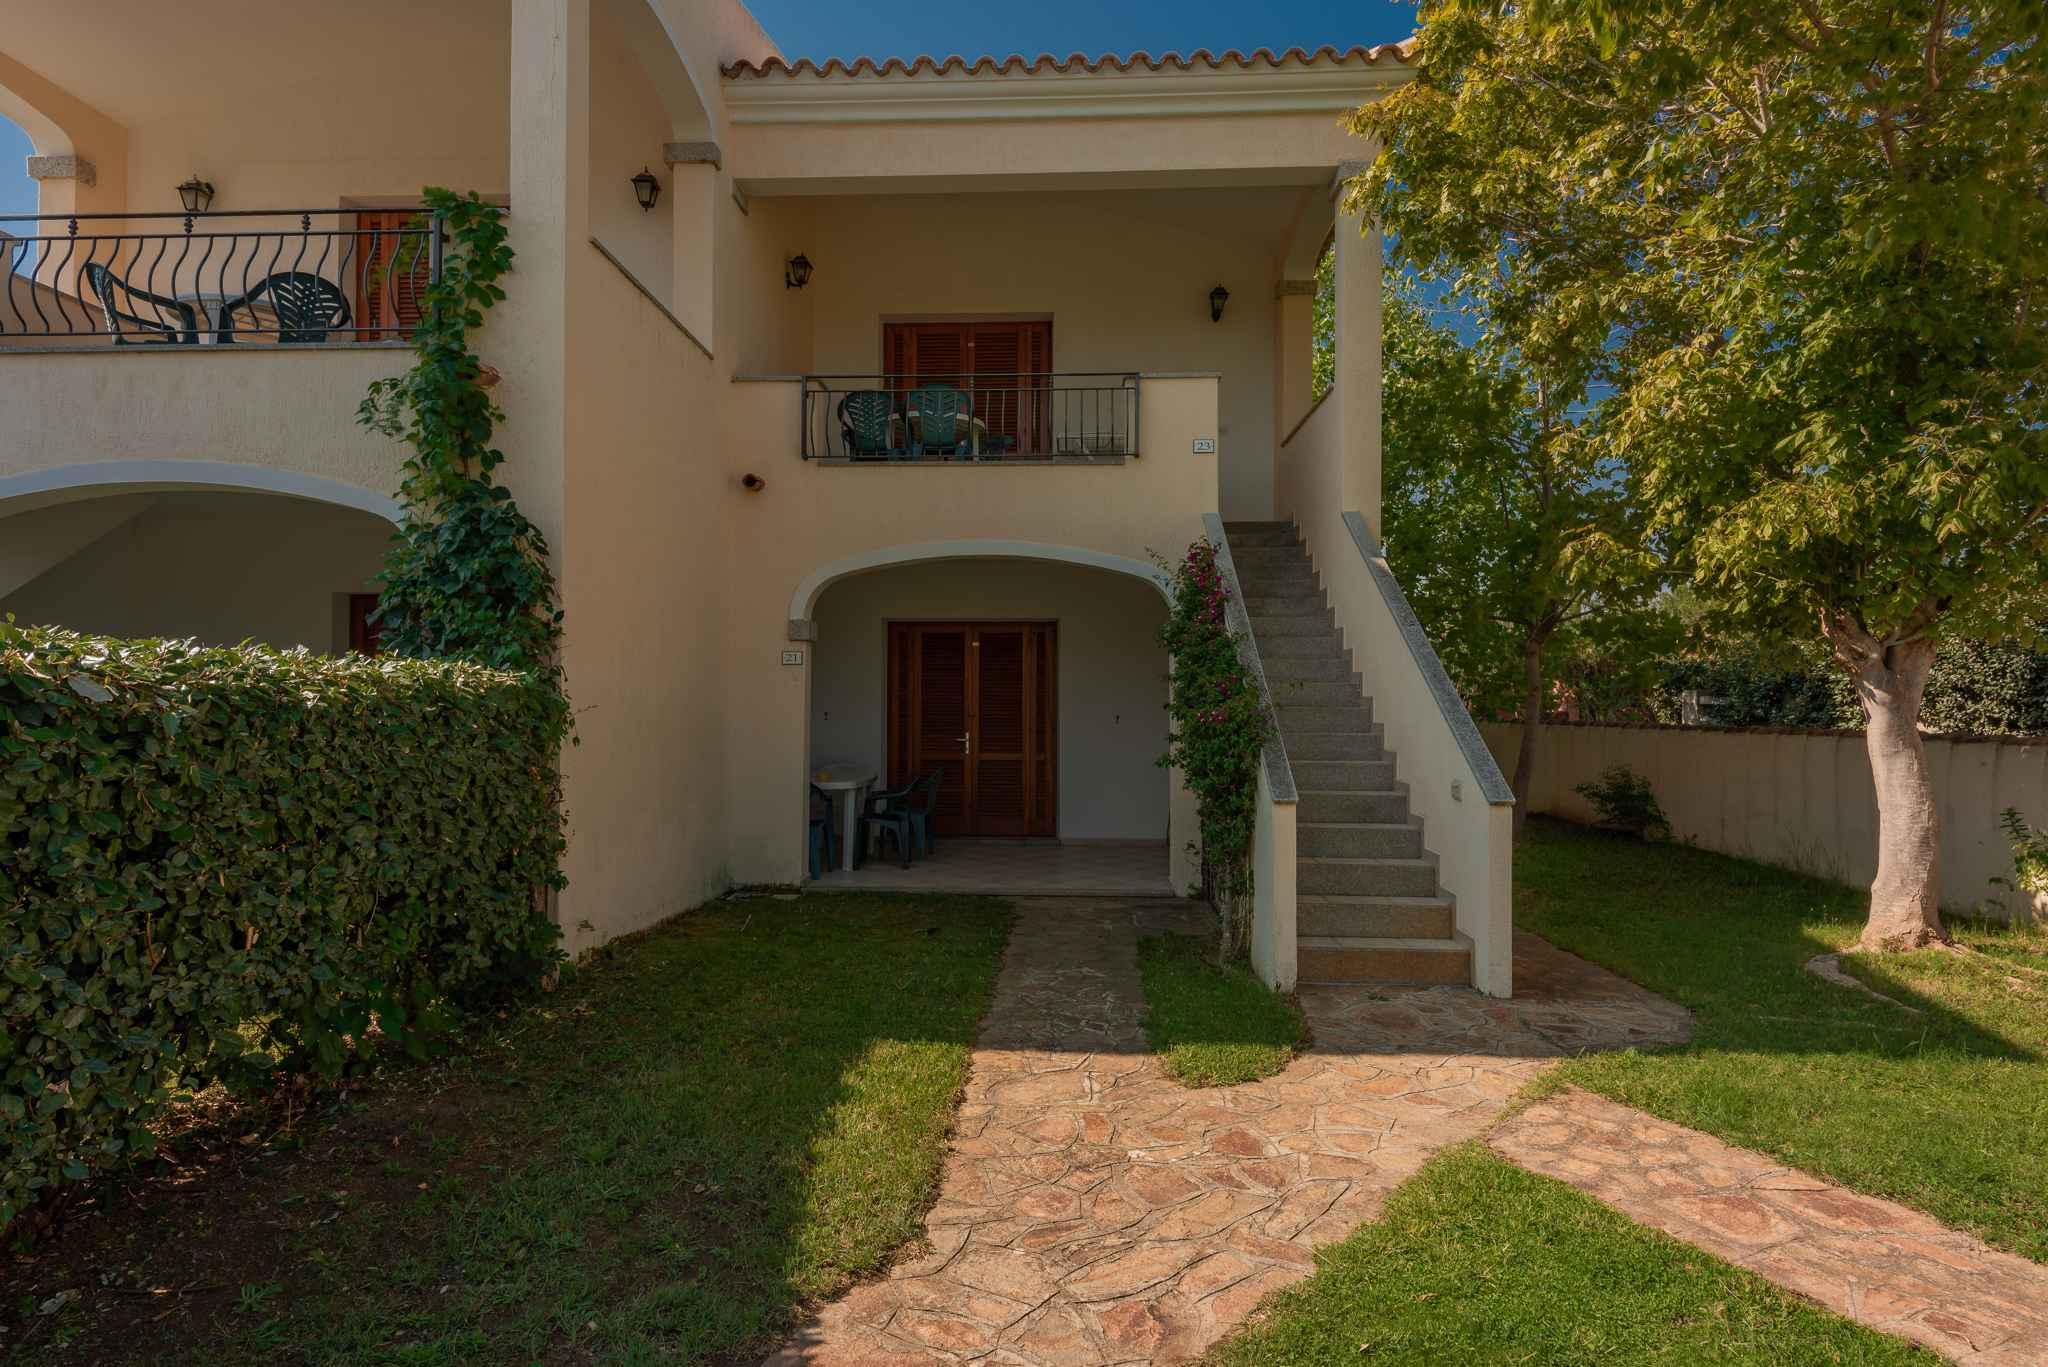 Ferienwohnung Appartamento 2 persone (2853259), Budoni, Olbia-Tempio, Sardinien, Italien, Bild 3